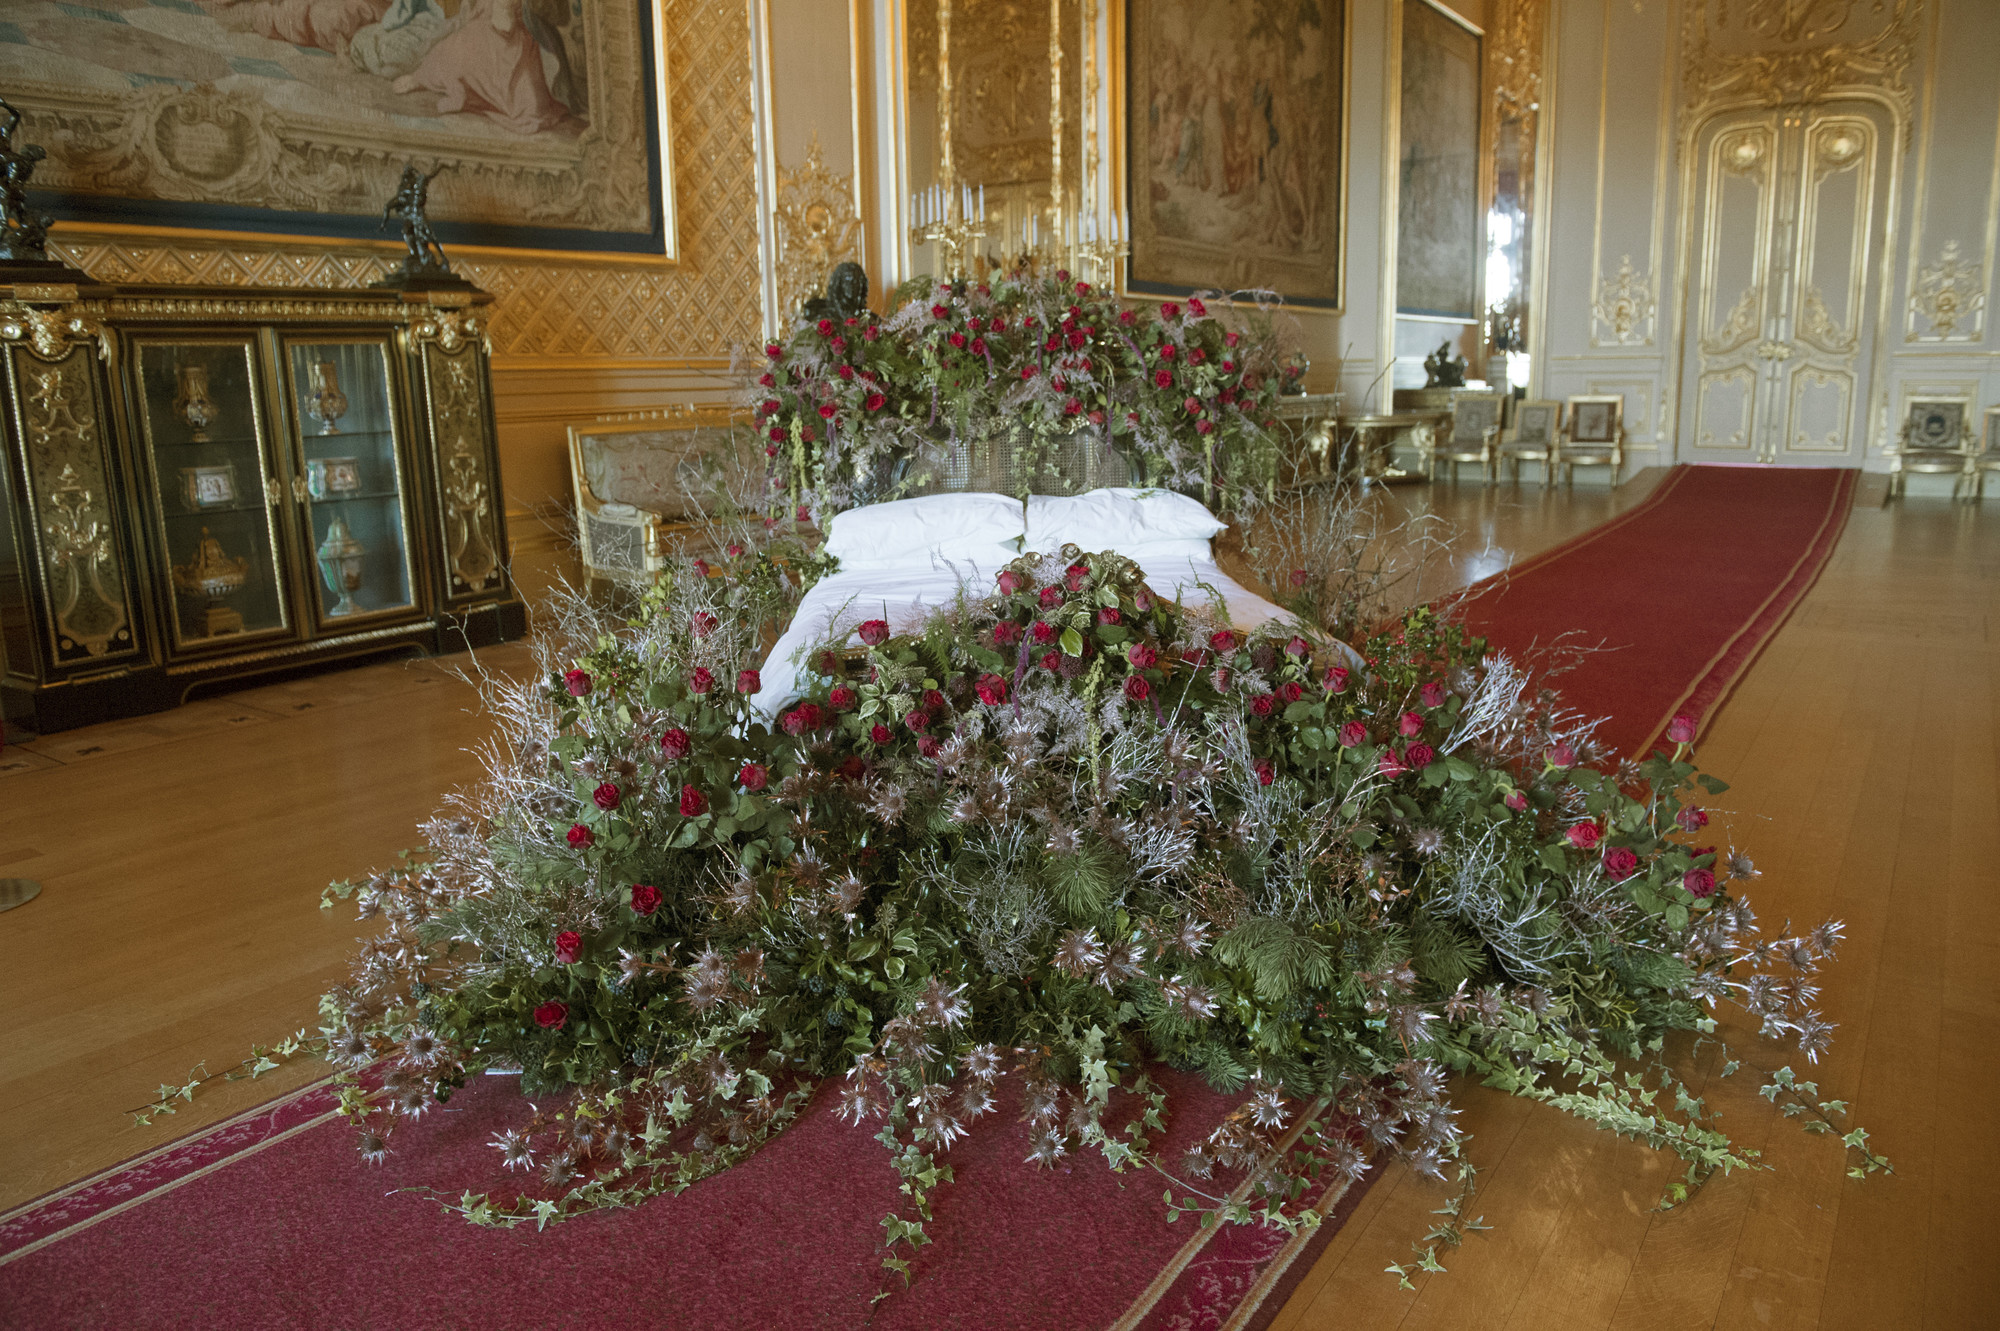 Sleeping Beauty Installation at Windsor Castle